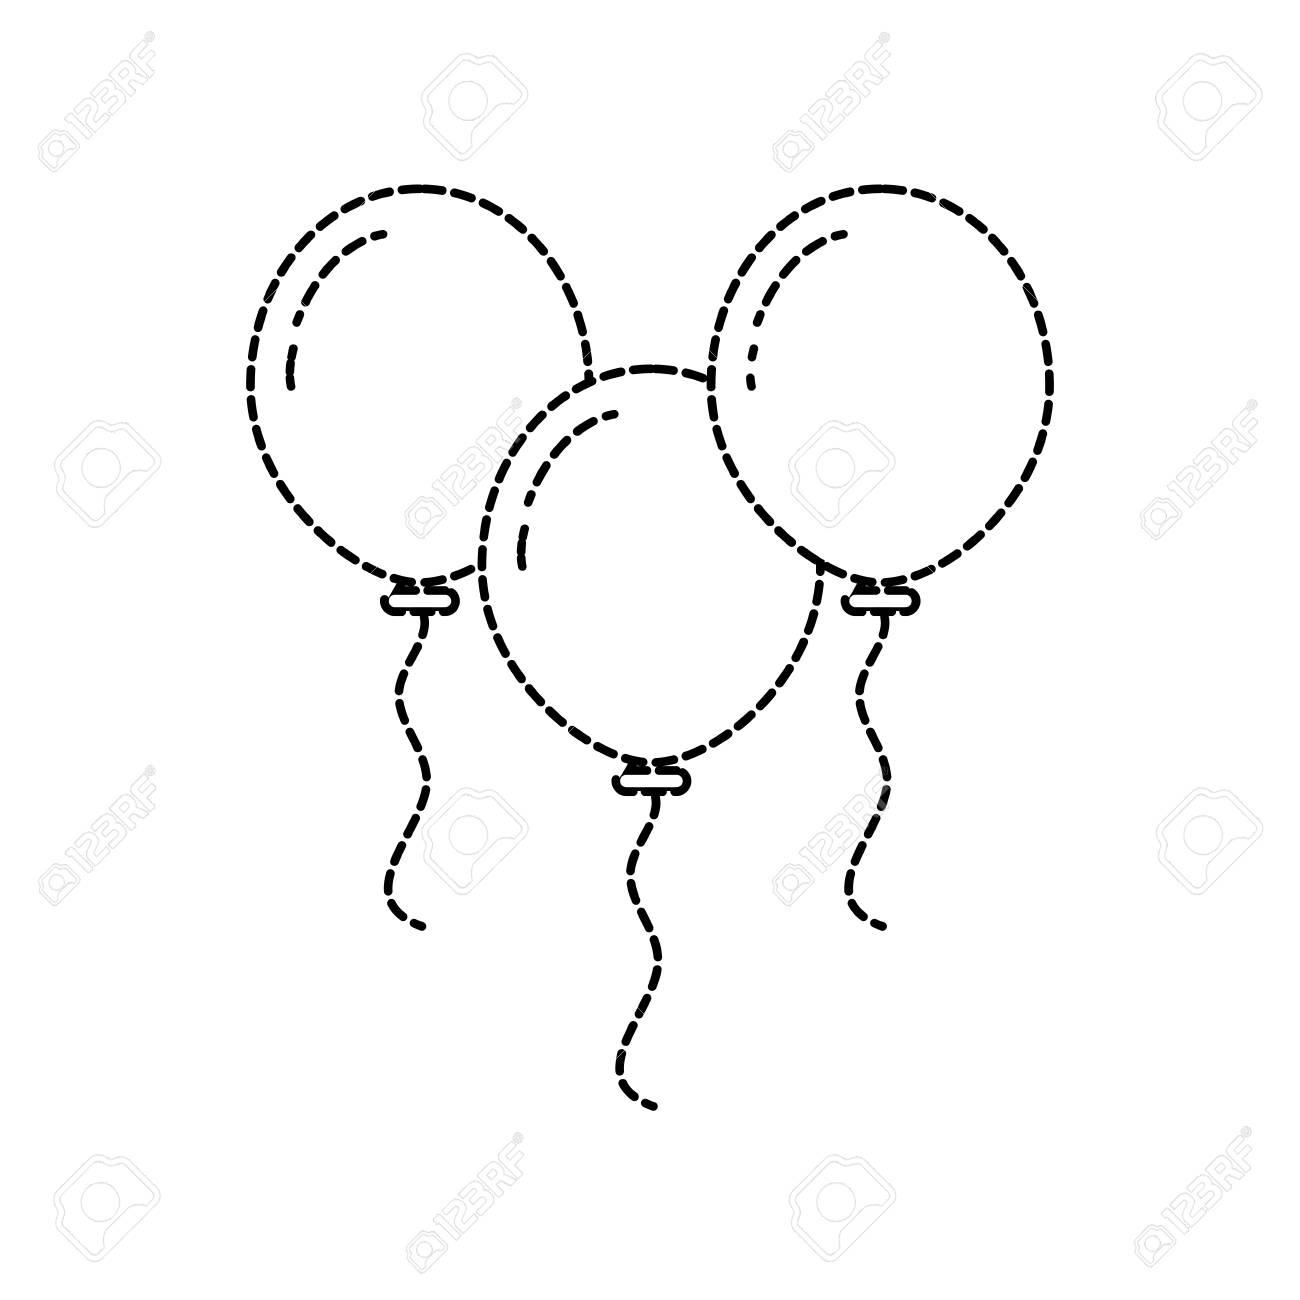 Christmas Three Balloons Flying Decoration Vector Illustration